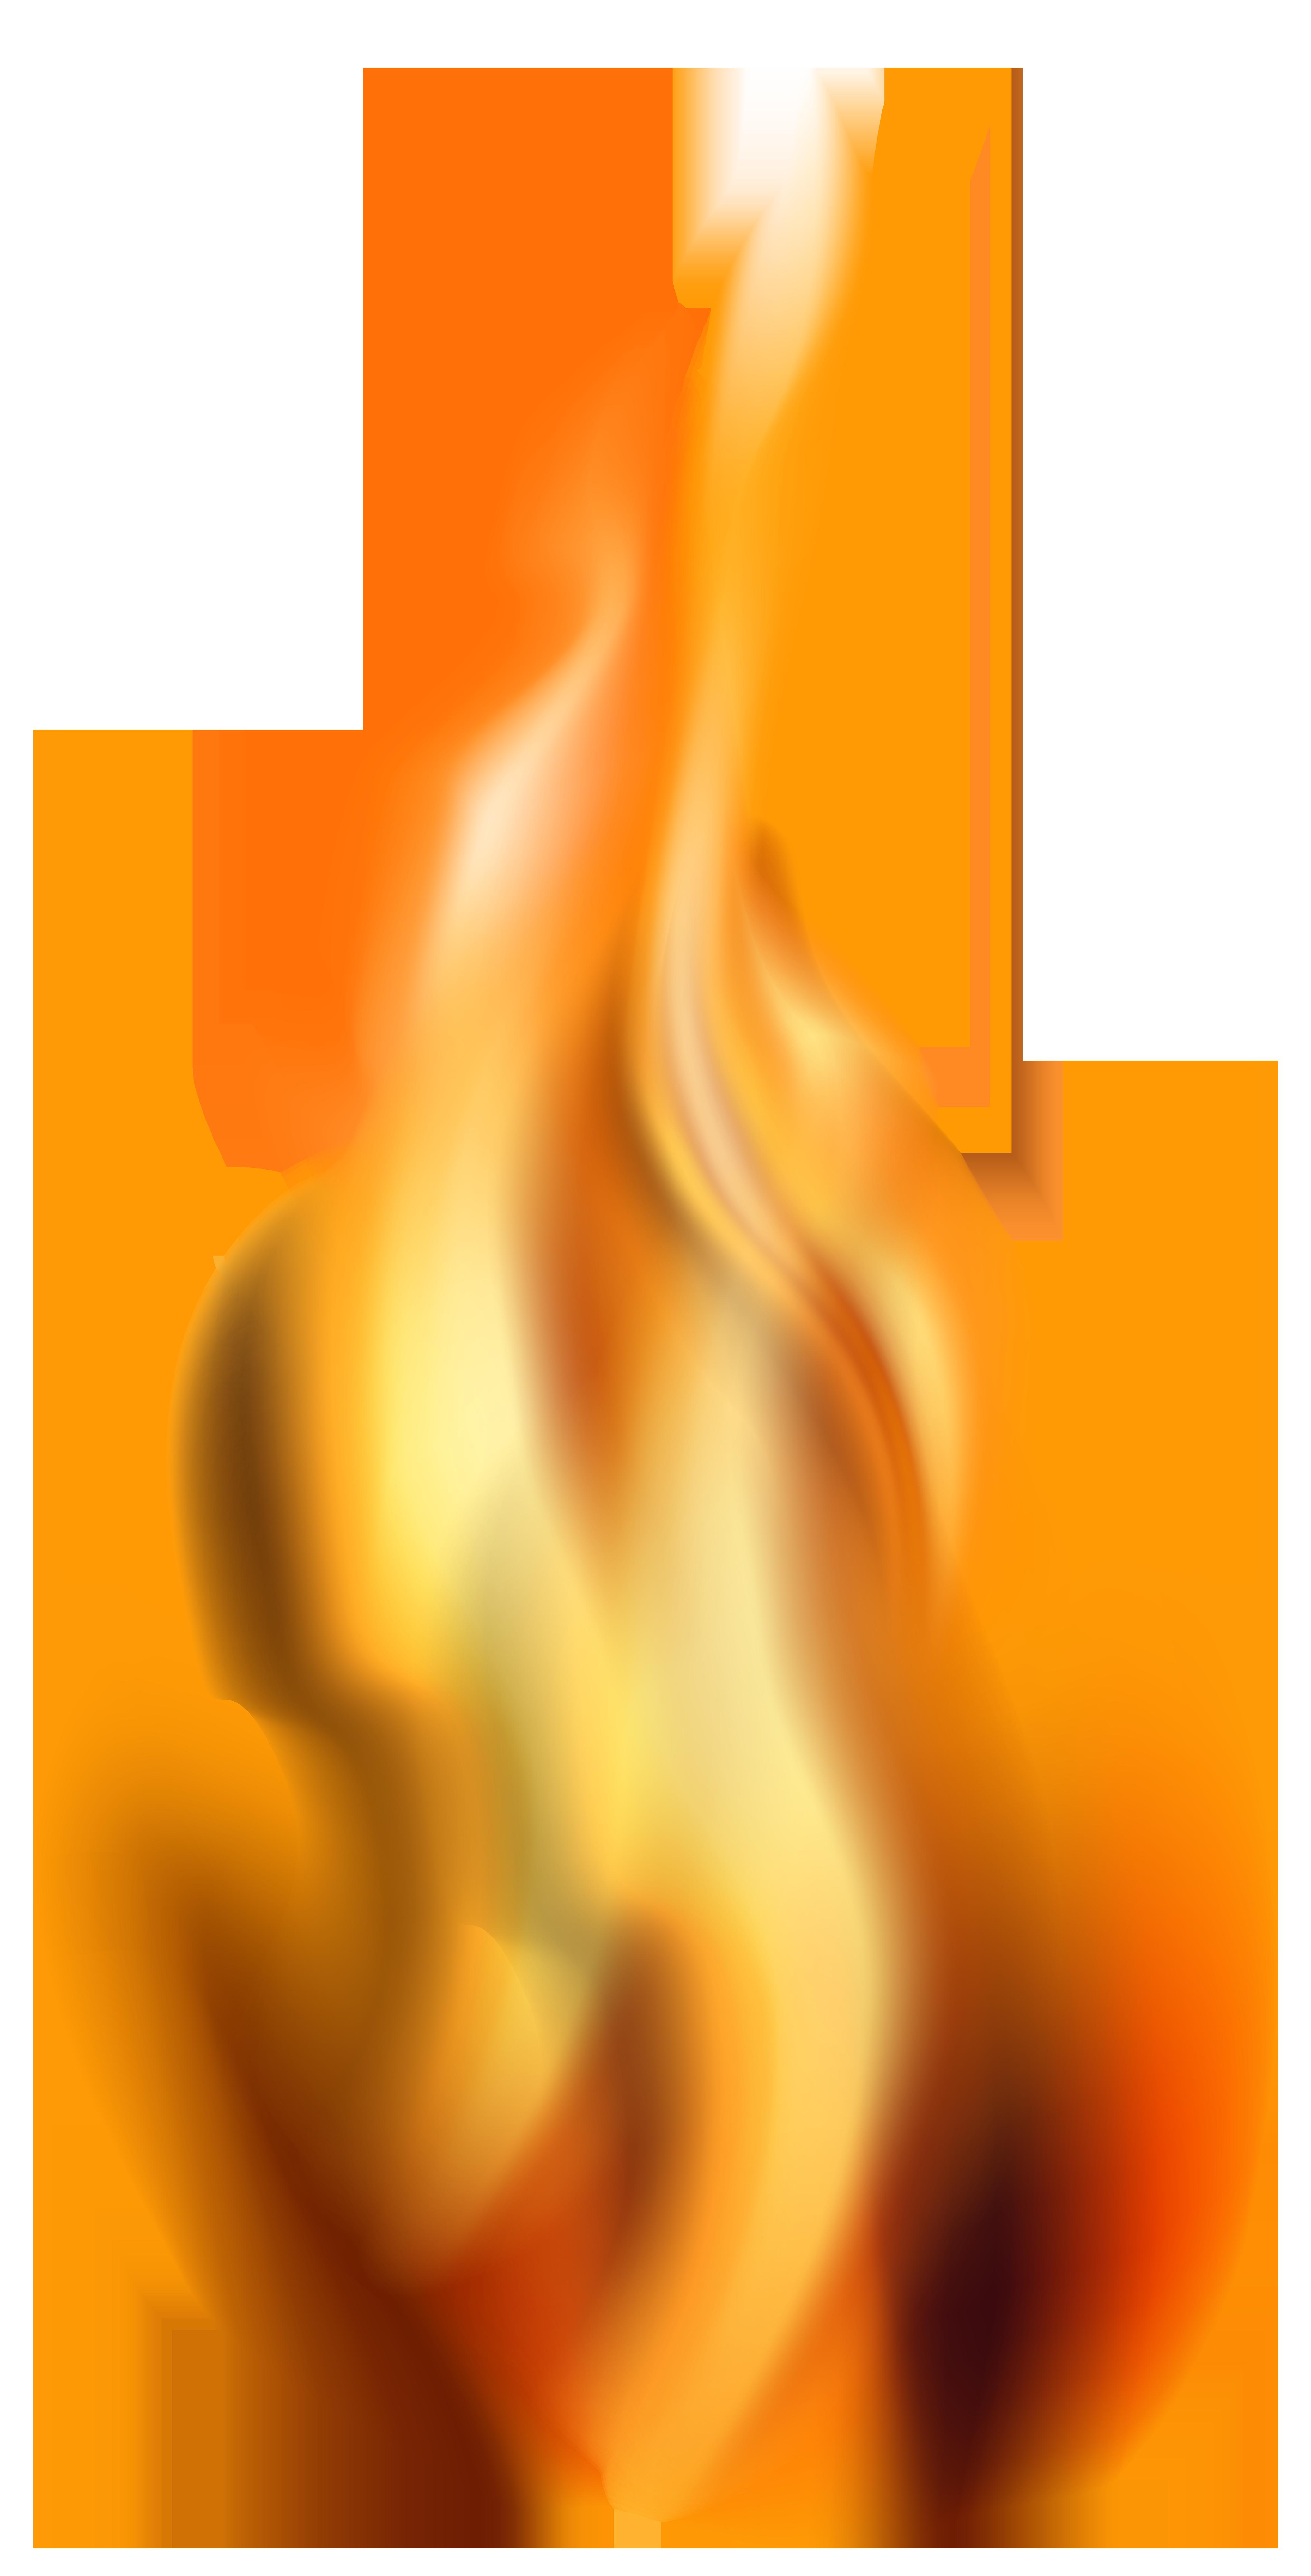 Fire clipart hand. Png transparent clip art